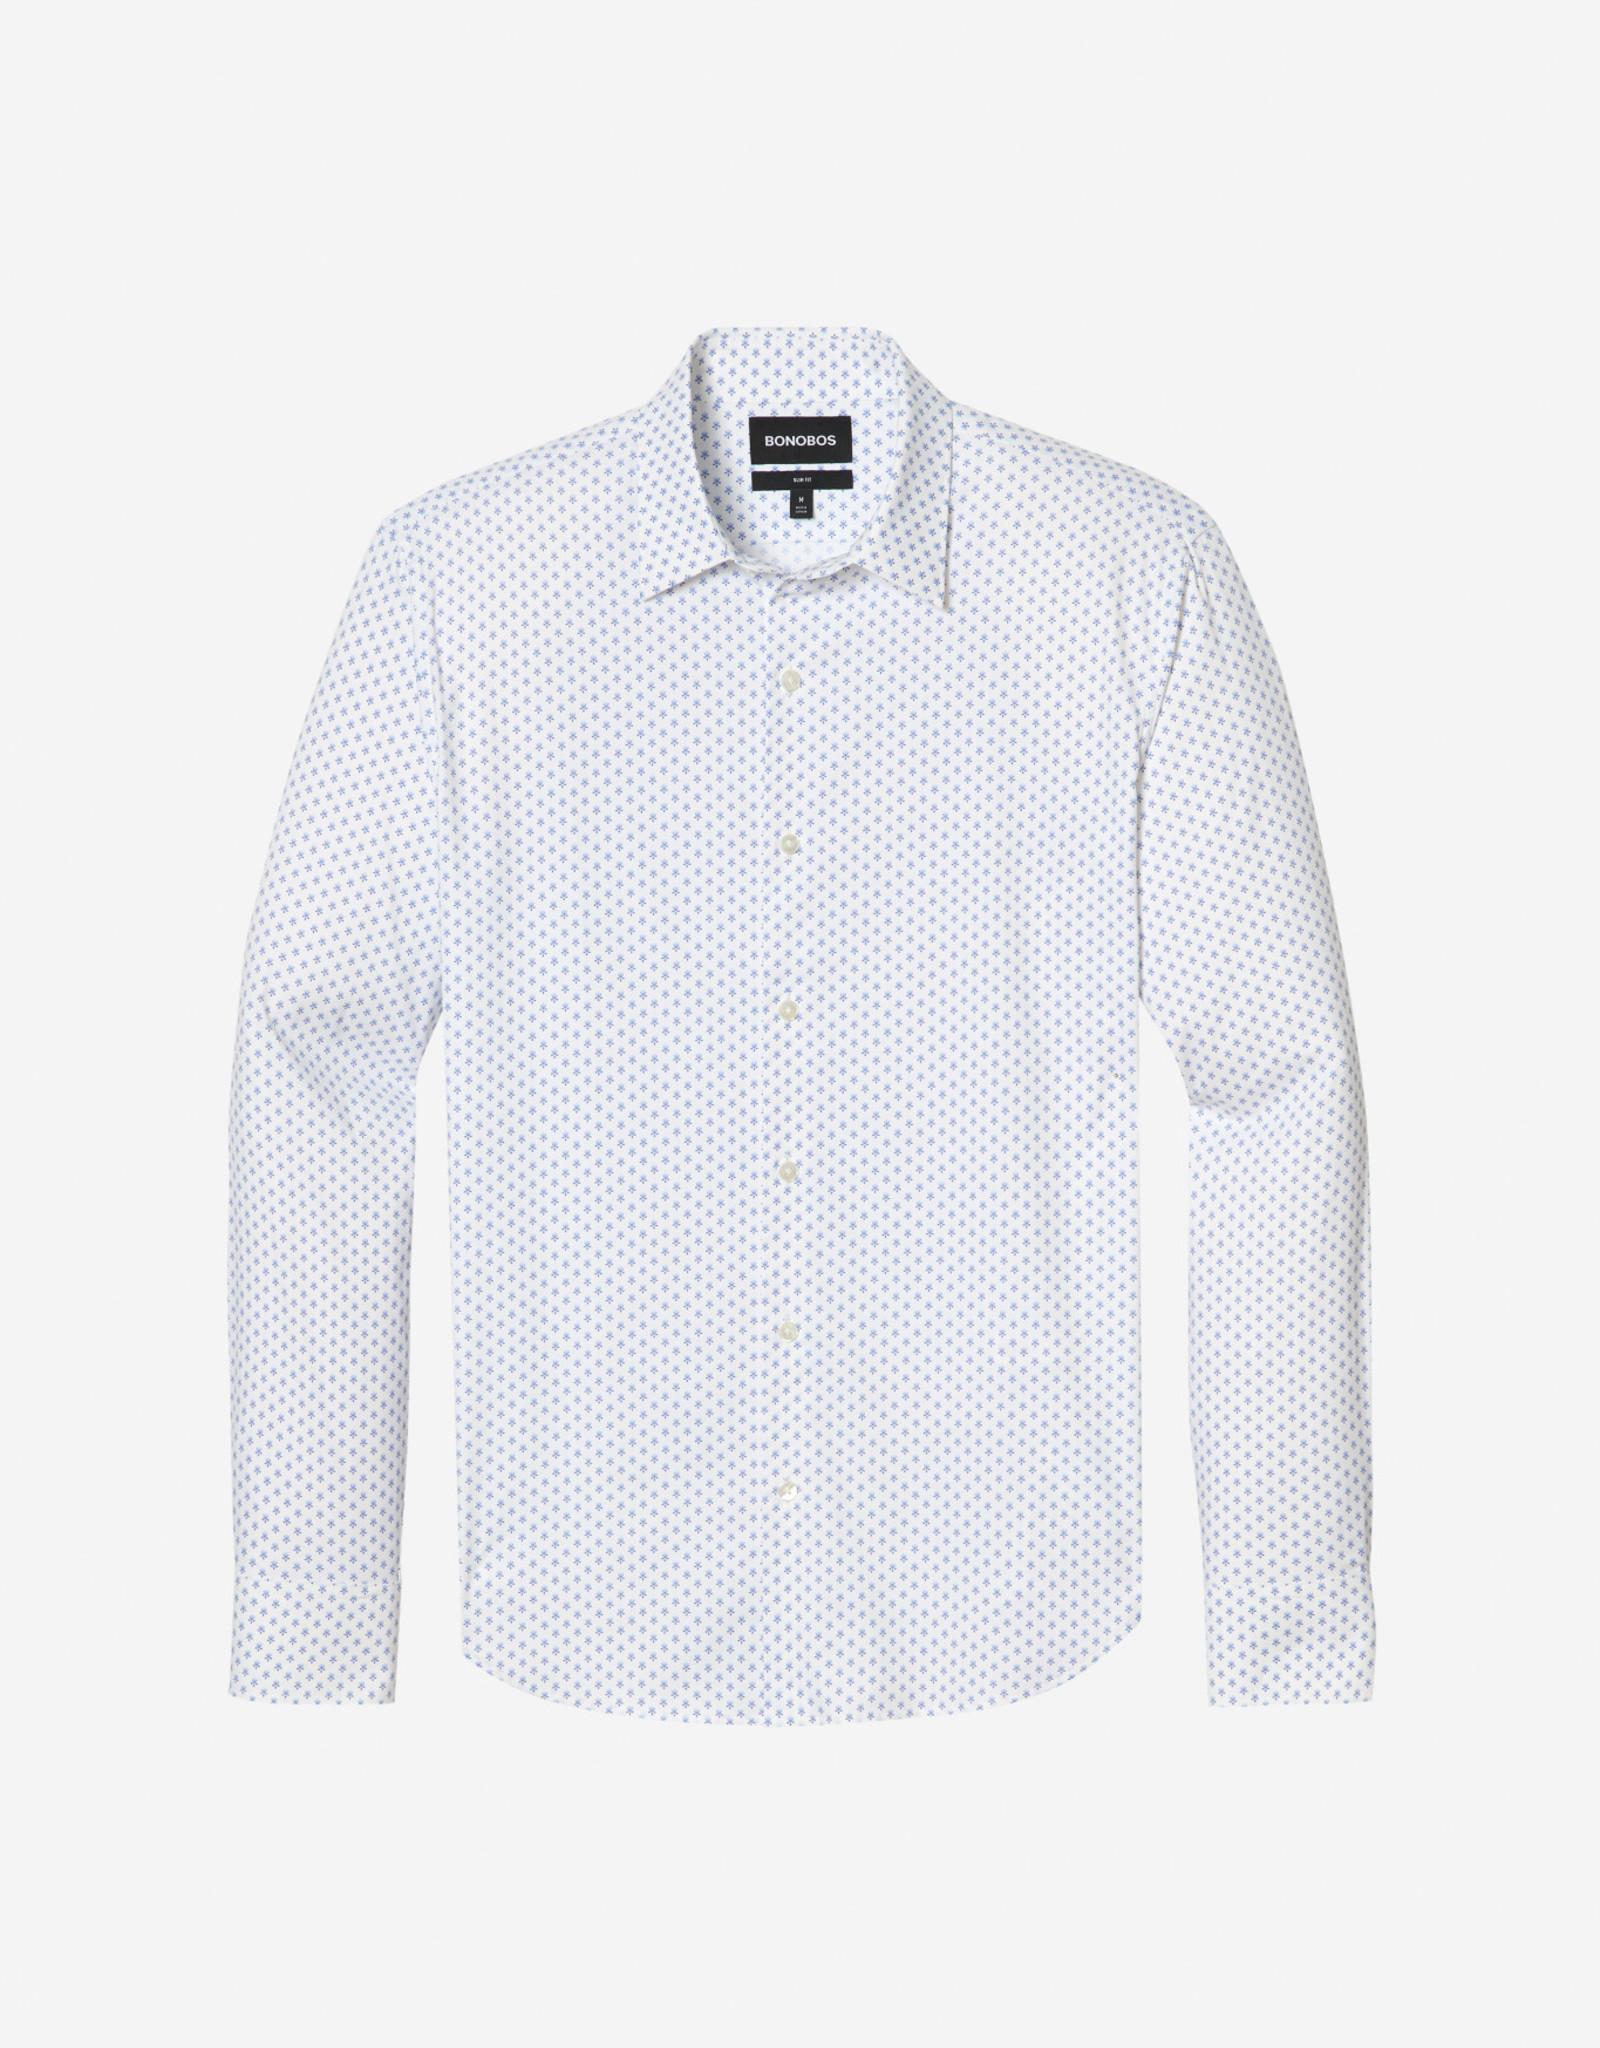 Bonobos Tech Button Down Shirt